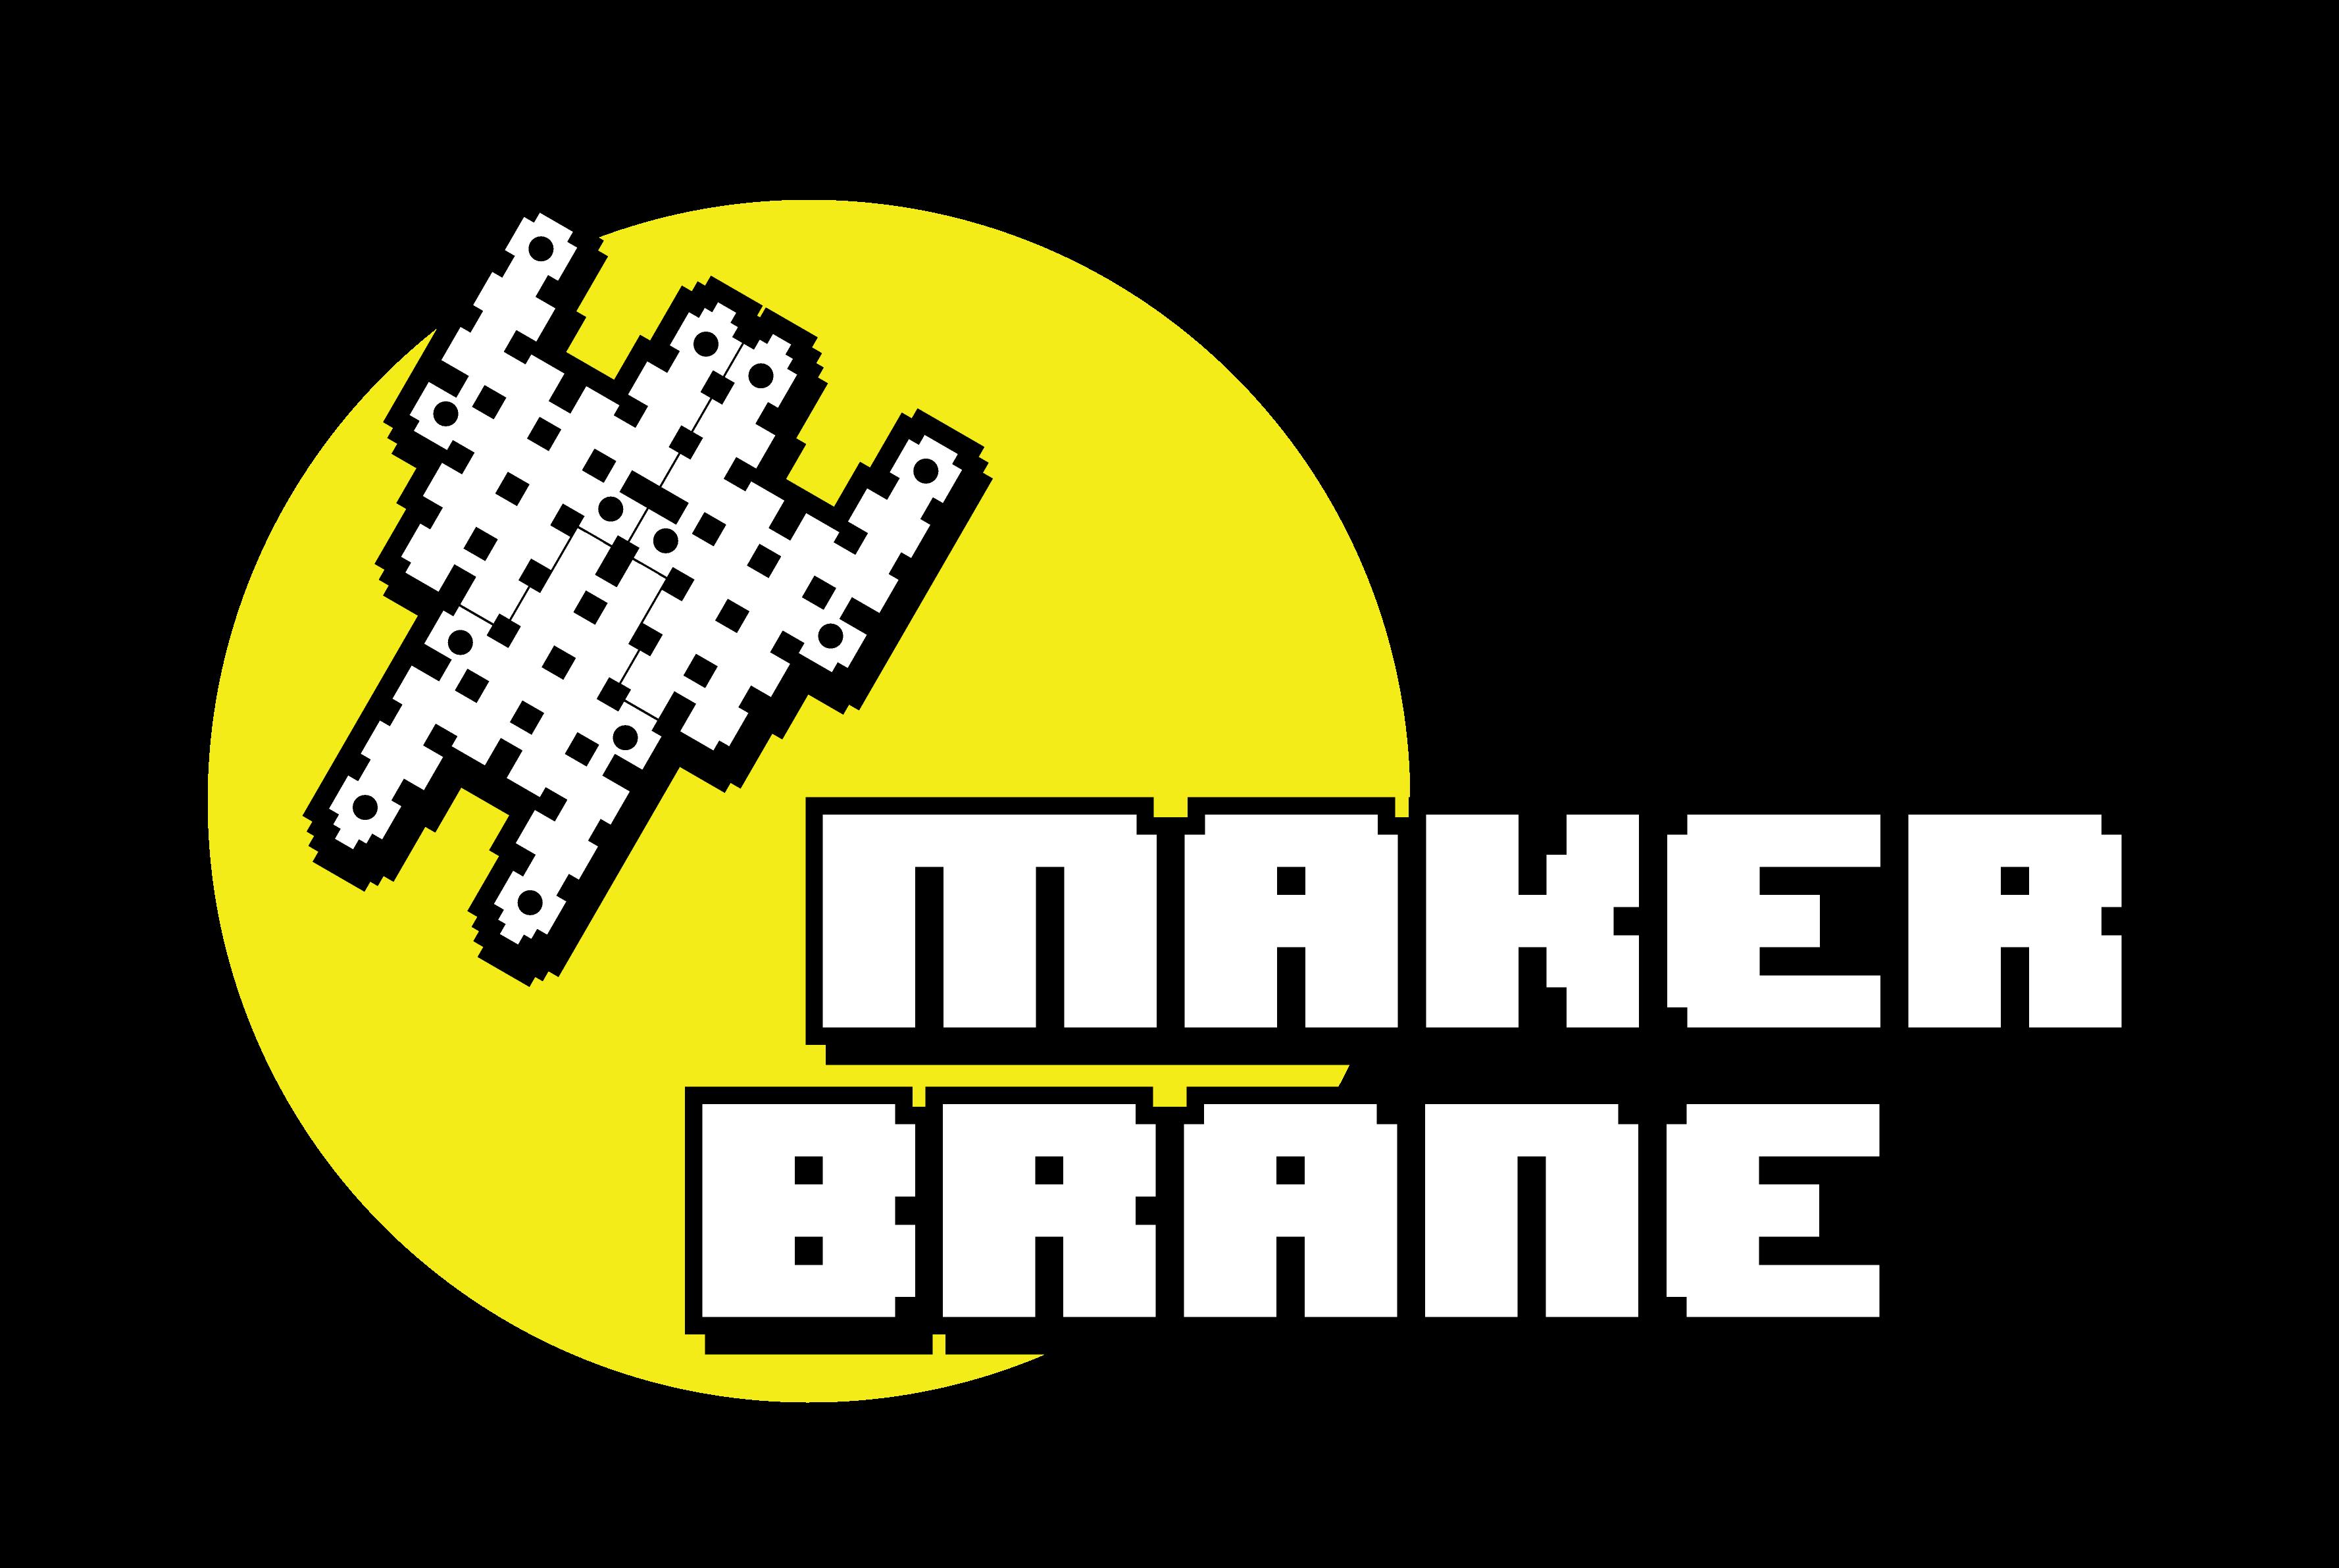 MakerBrane logo